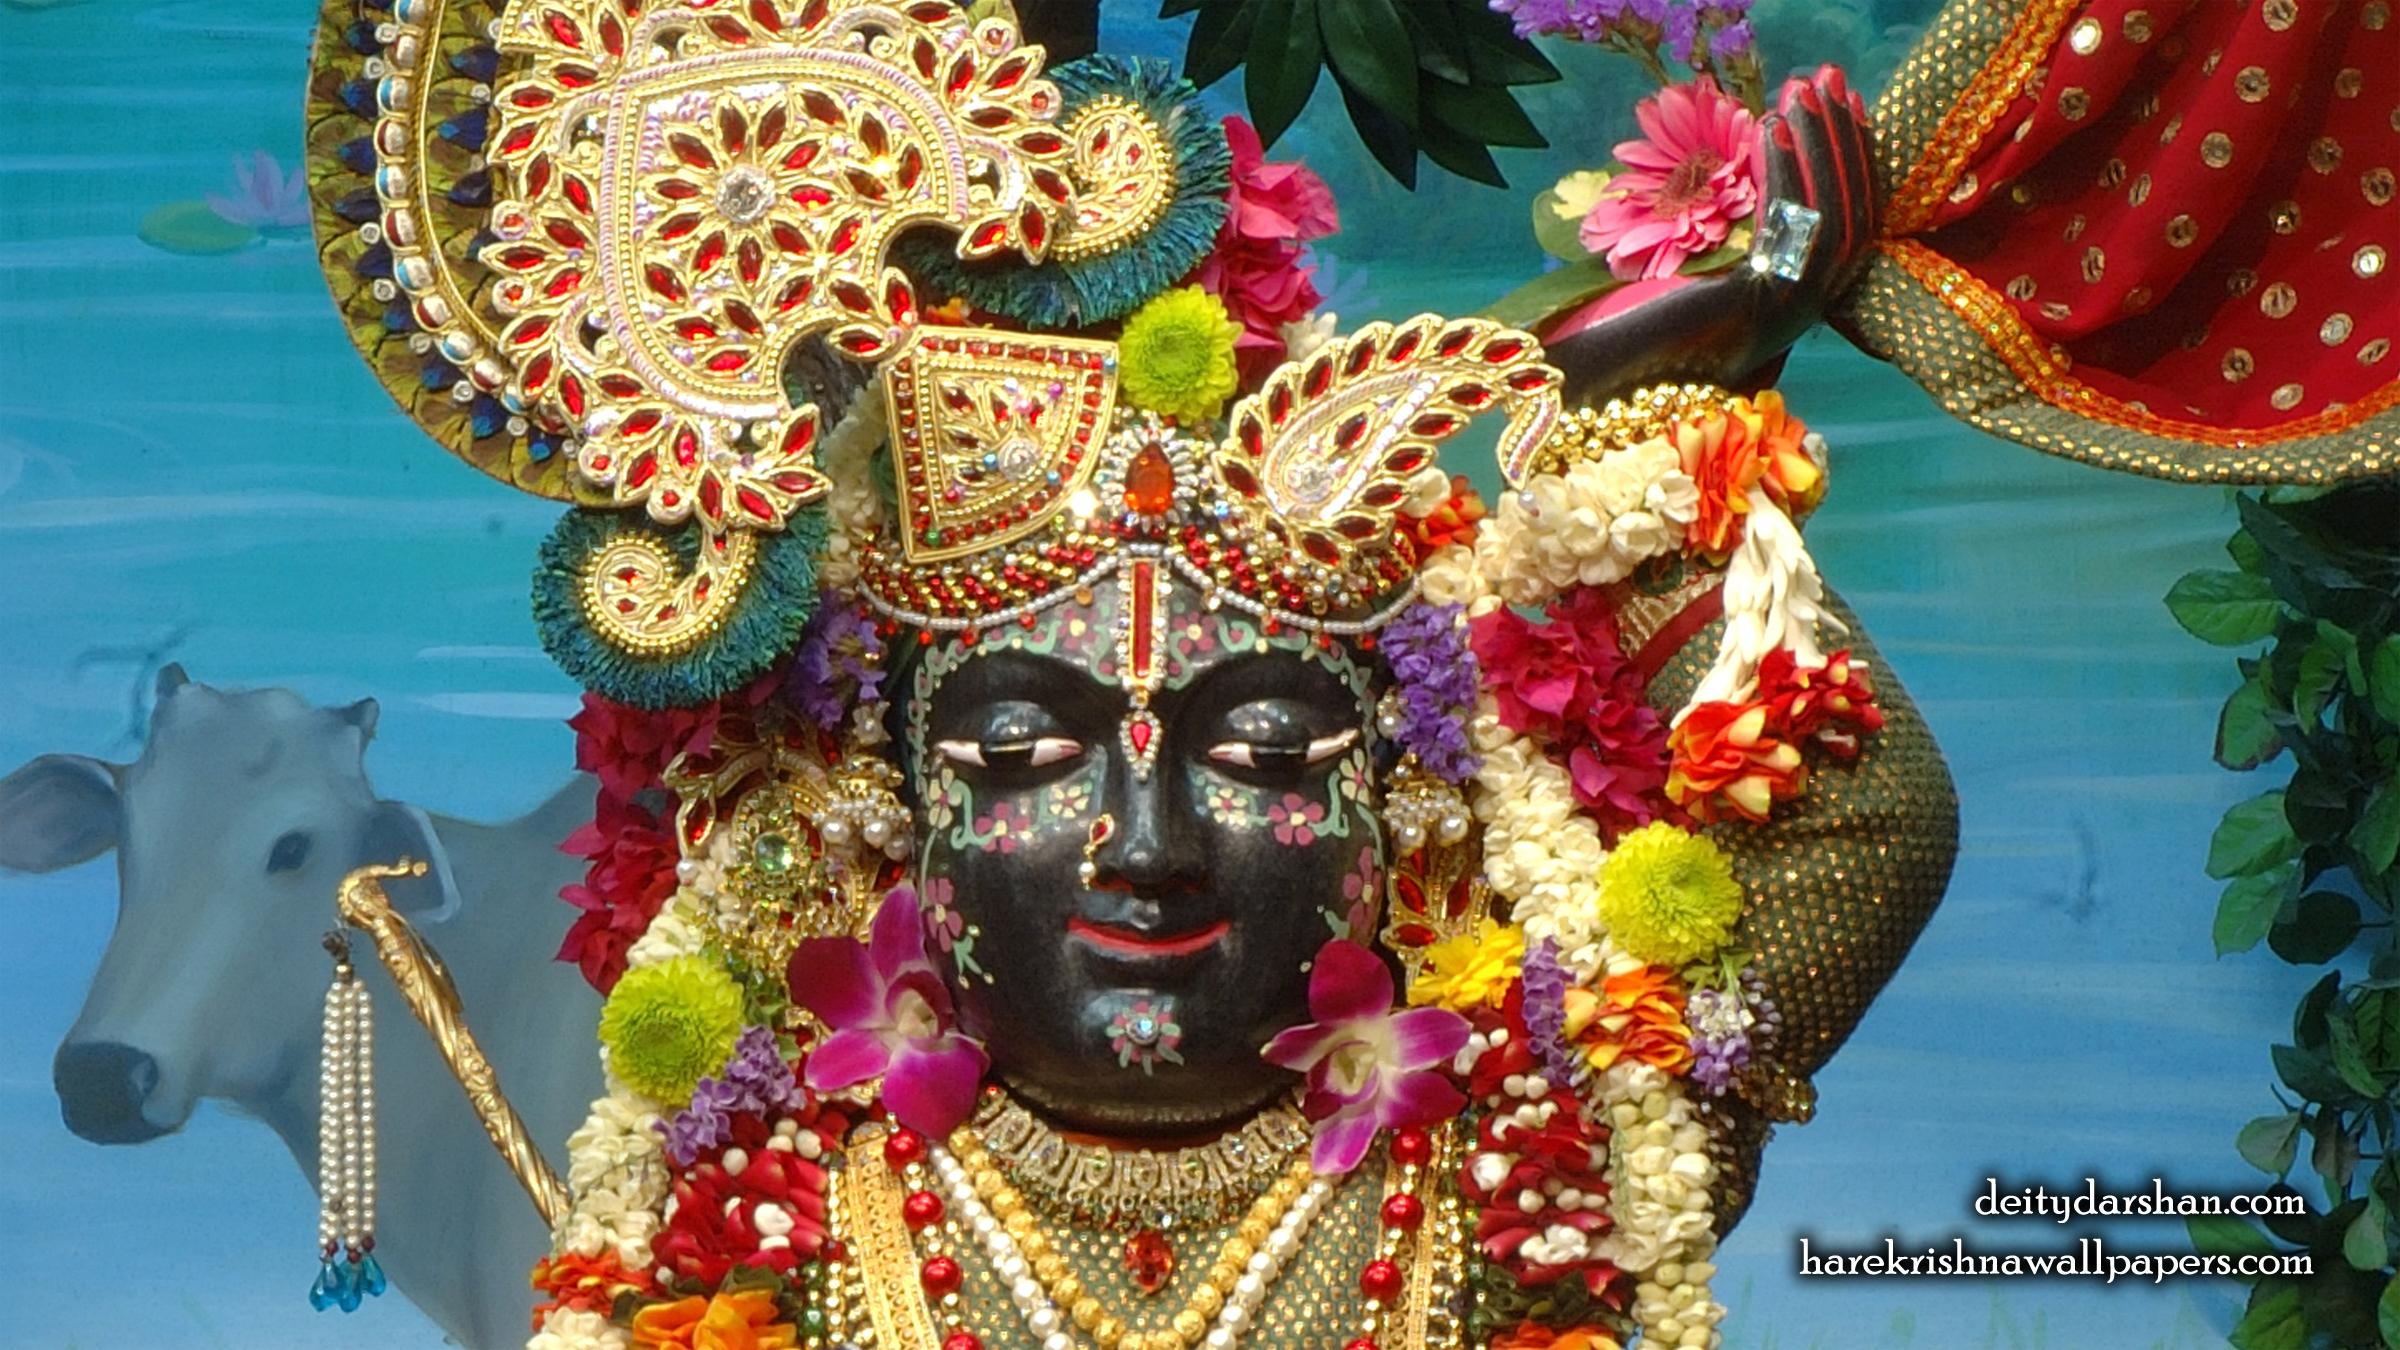 Sri Gopal Close up Wallpaper (024) Size 2400x1350 Download